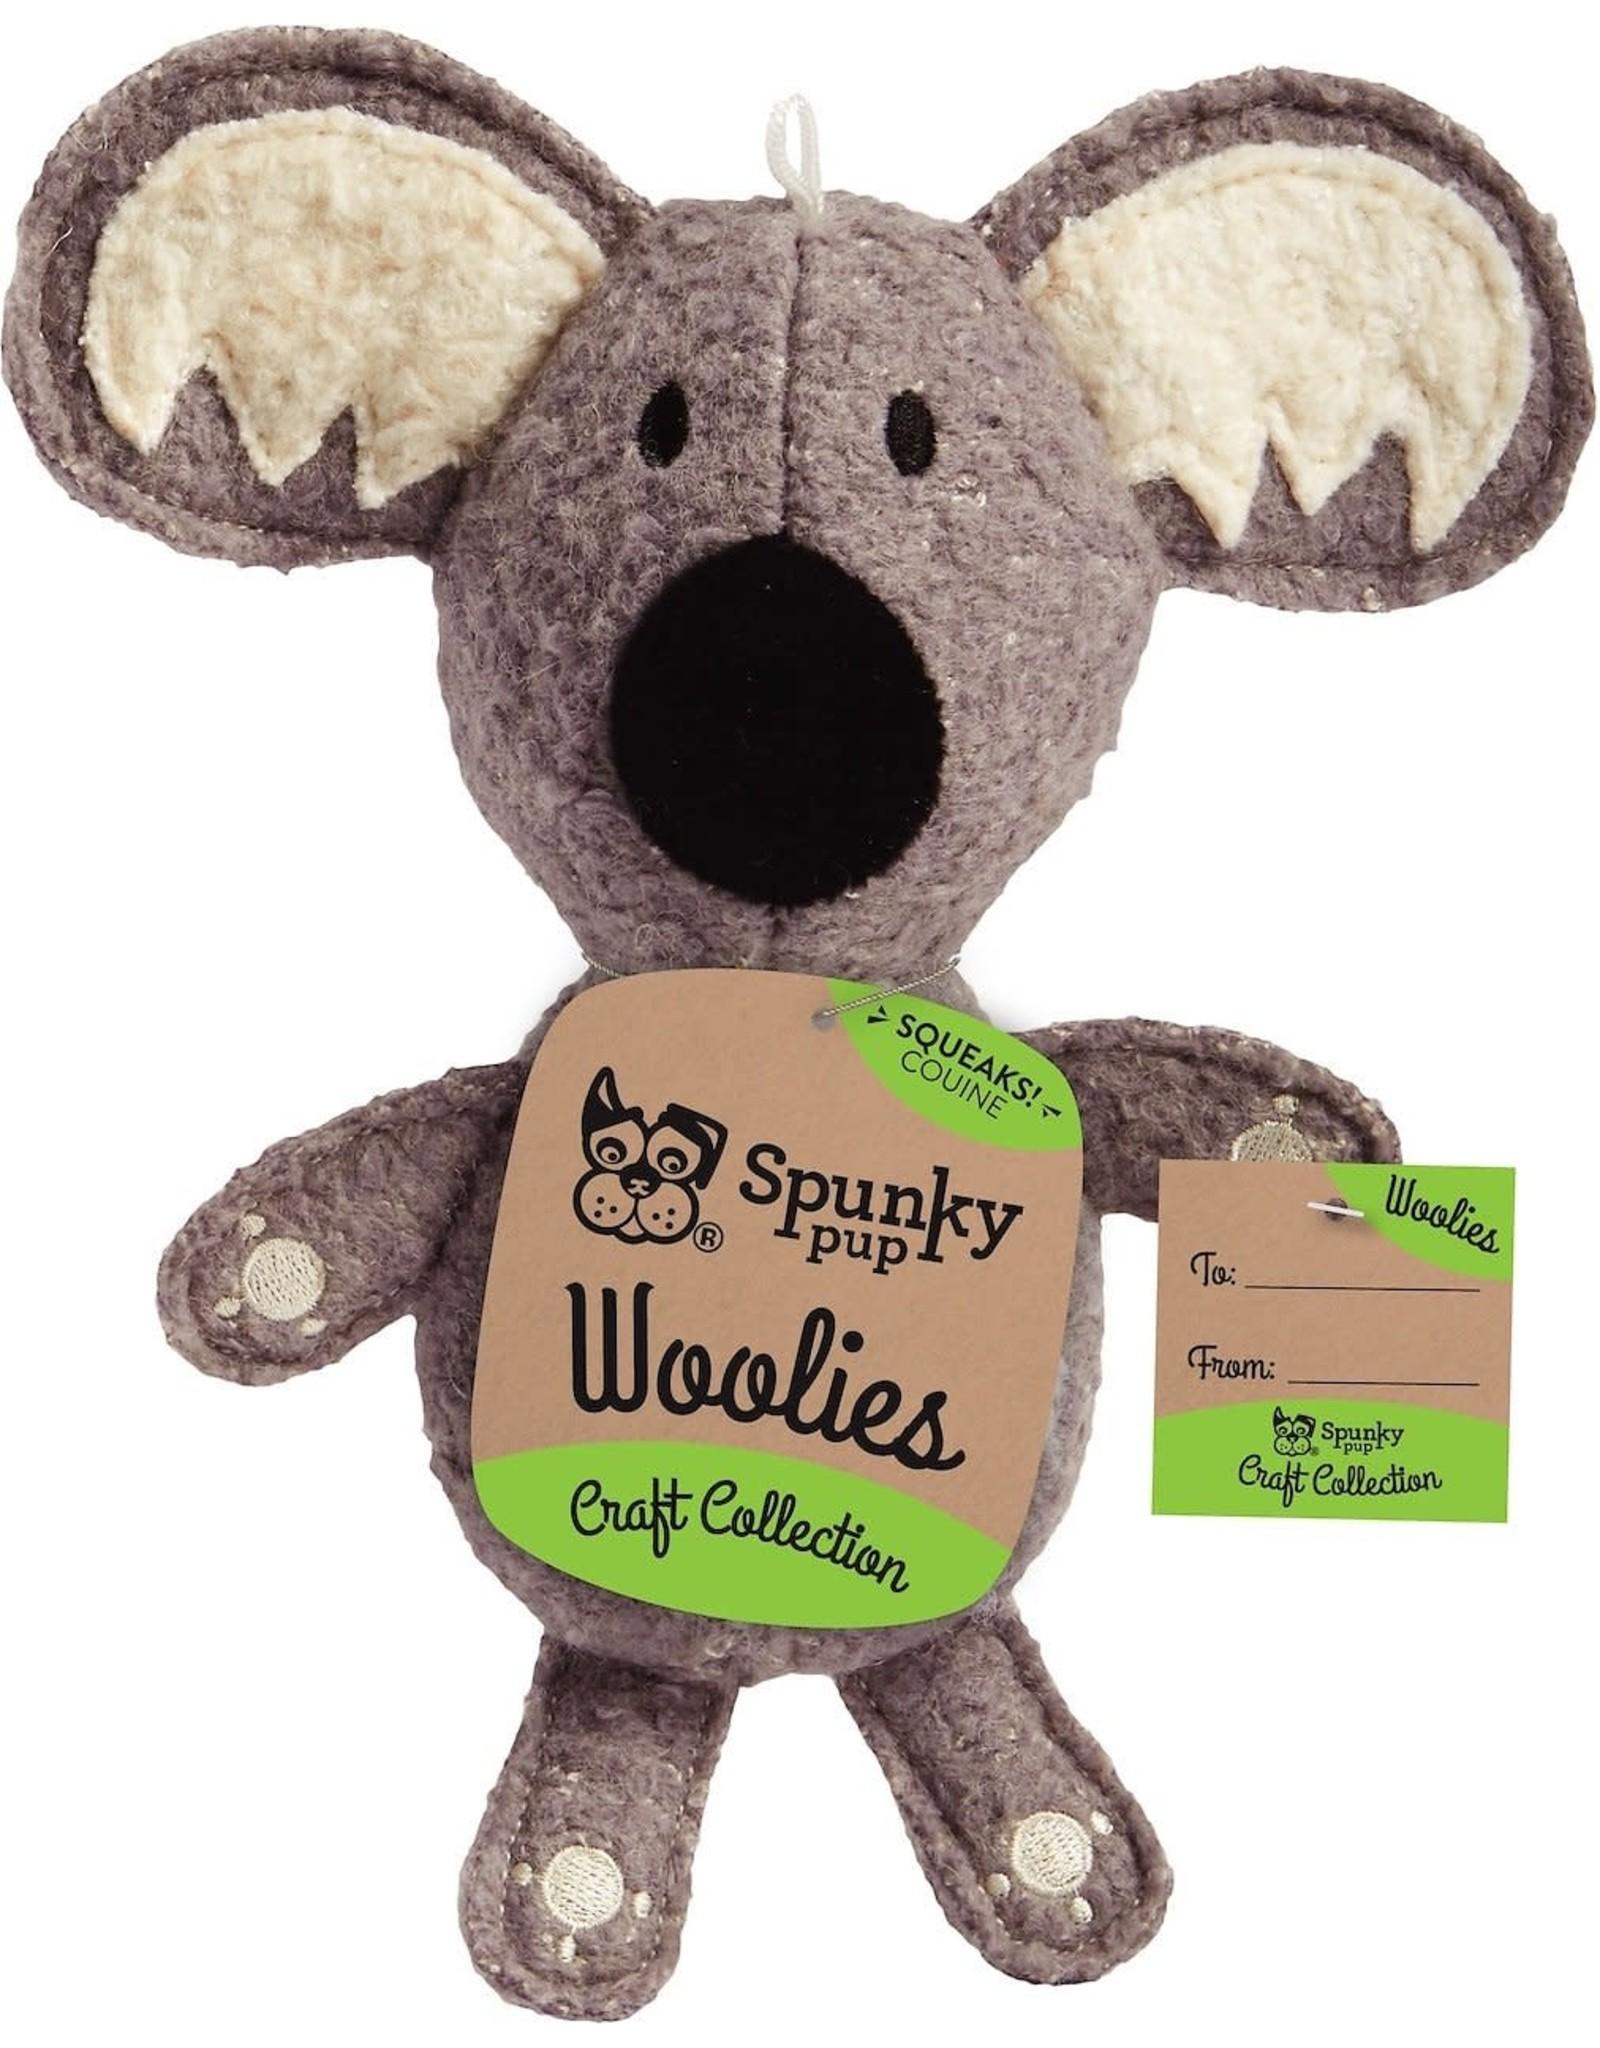 Spunky Pup SPUNKY PUP CRAFT COLLECTION WOOLIES KOALA TOY